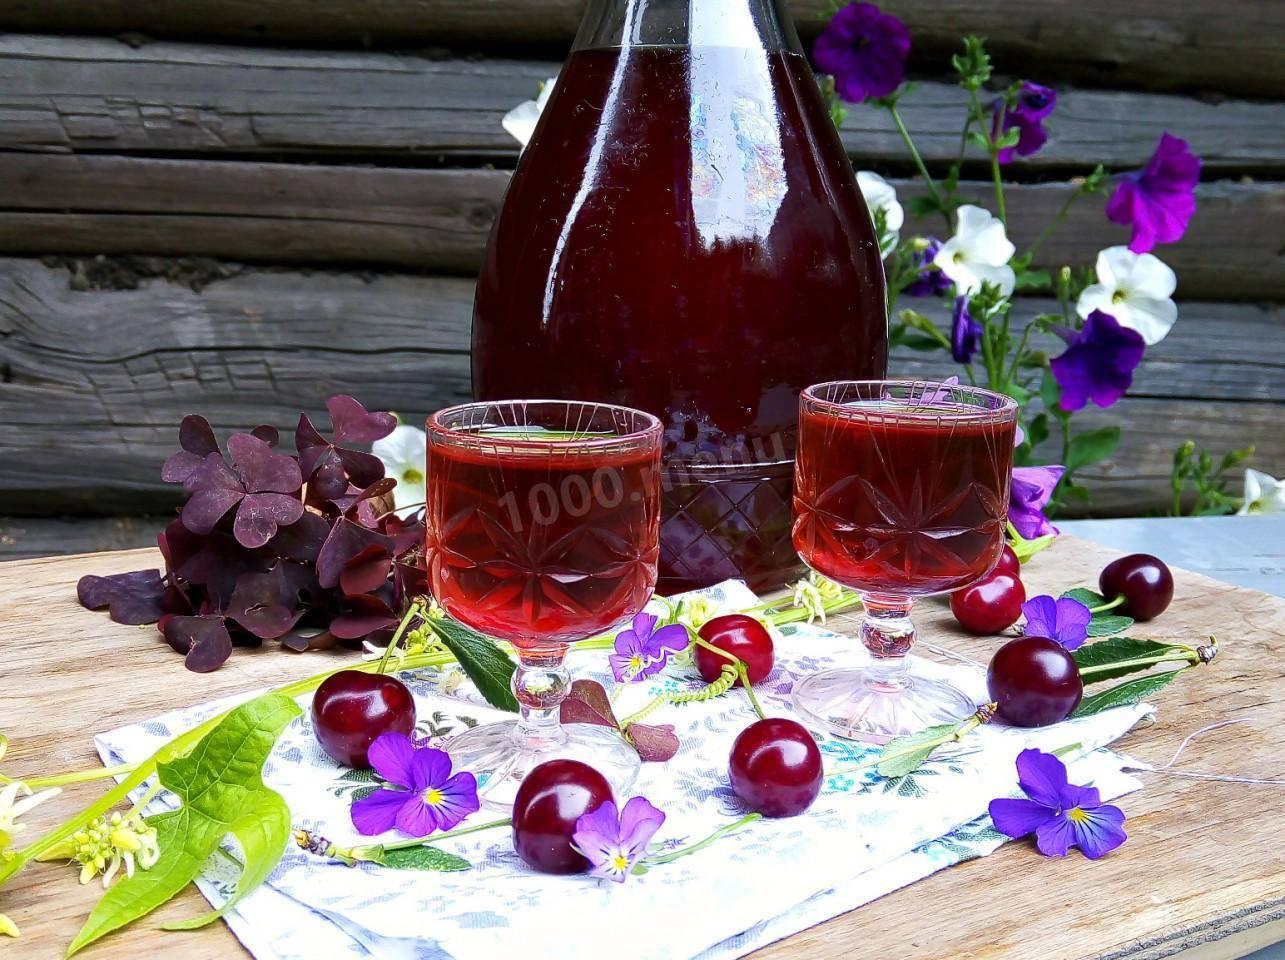 Ликер из вишни в домашних условиях: топ-5 рецептов